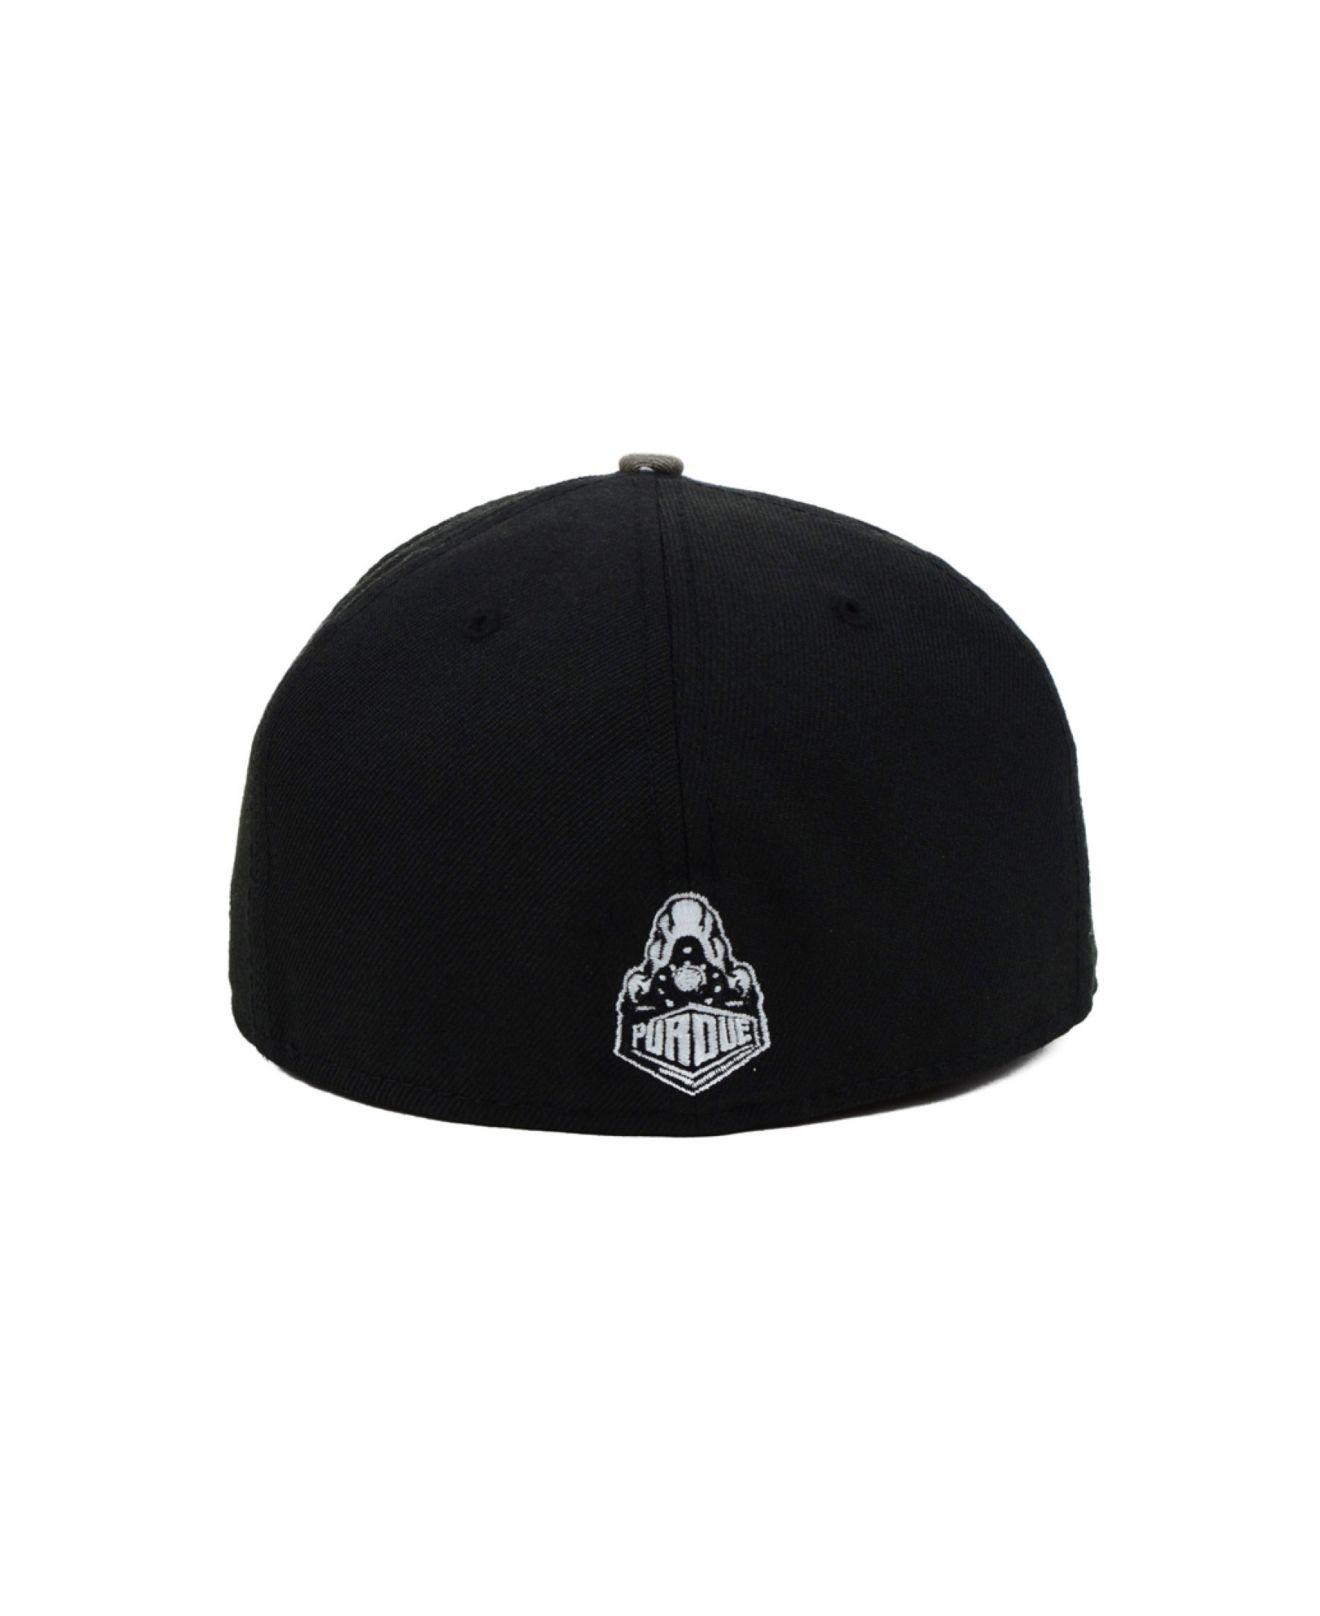 sale retailer 31f77 ce4df ... discount lyst ktz purdue boilermakers ncaa urban camo 59fifty cap in  white 8e41f 58e88